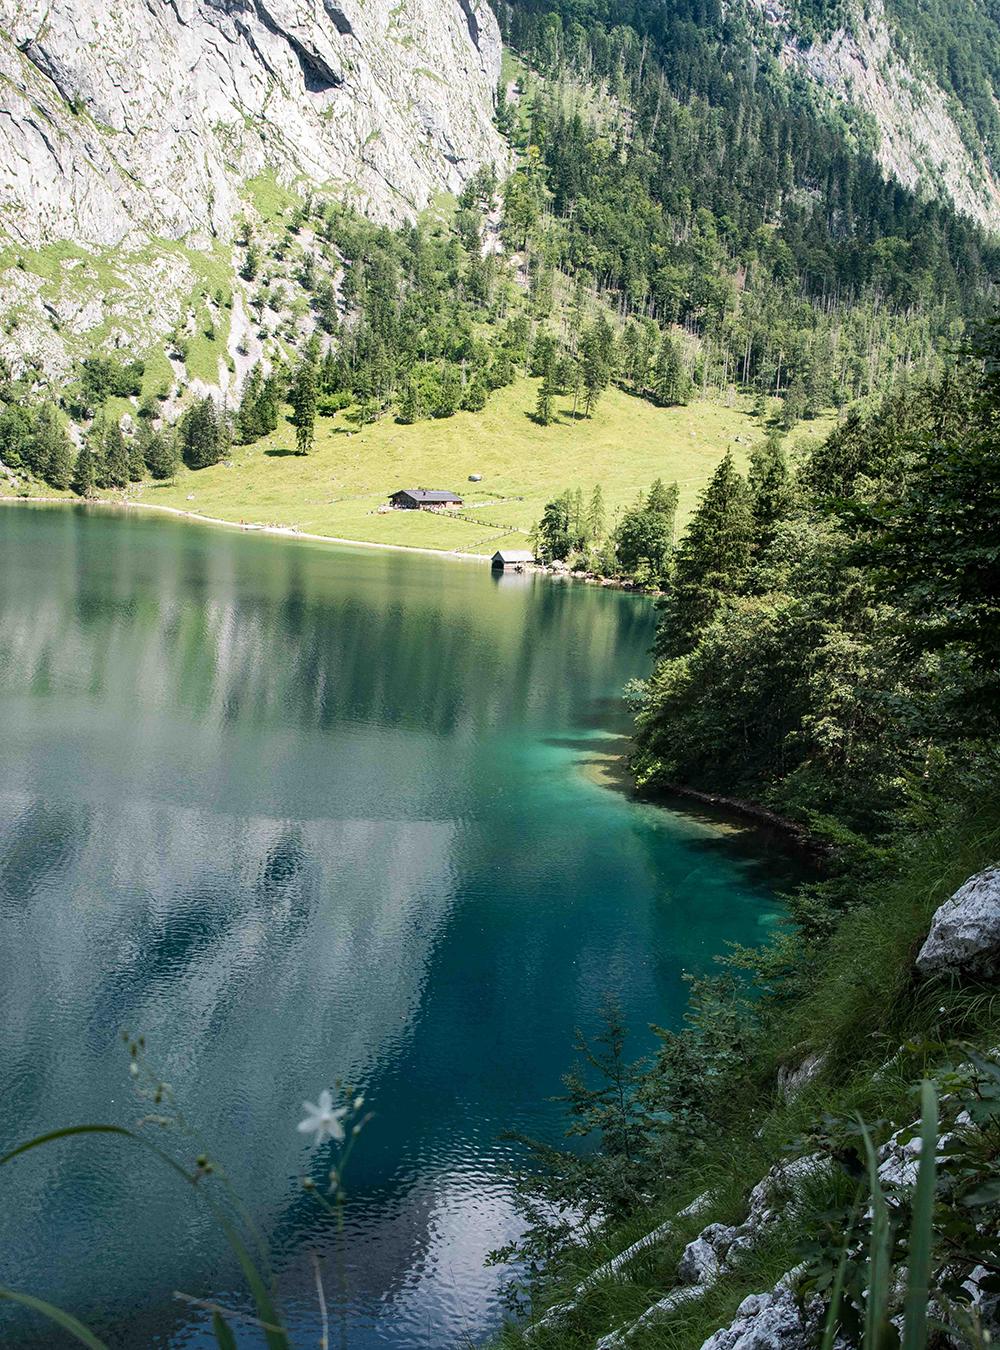 Obersee am Königssee - Fischunkelalm